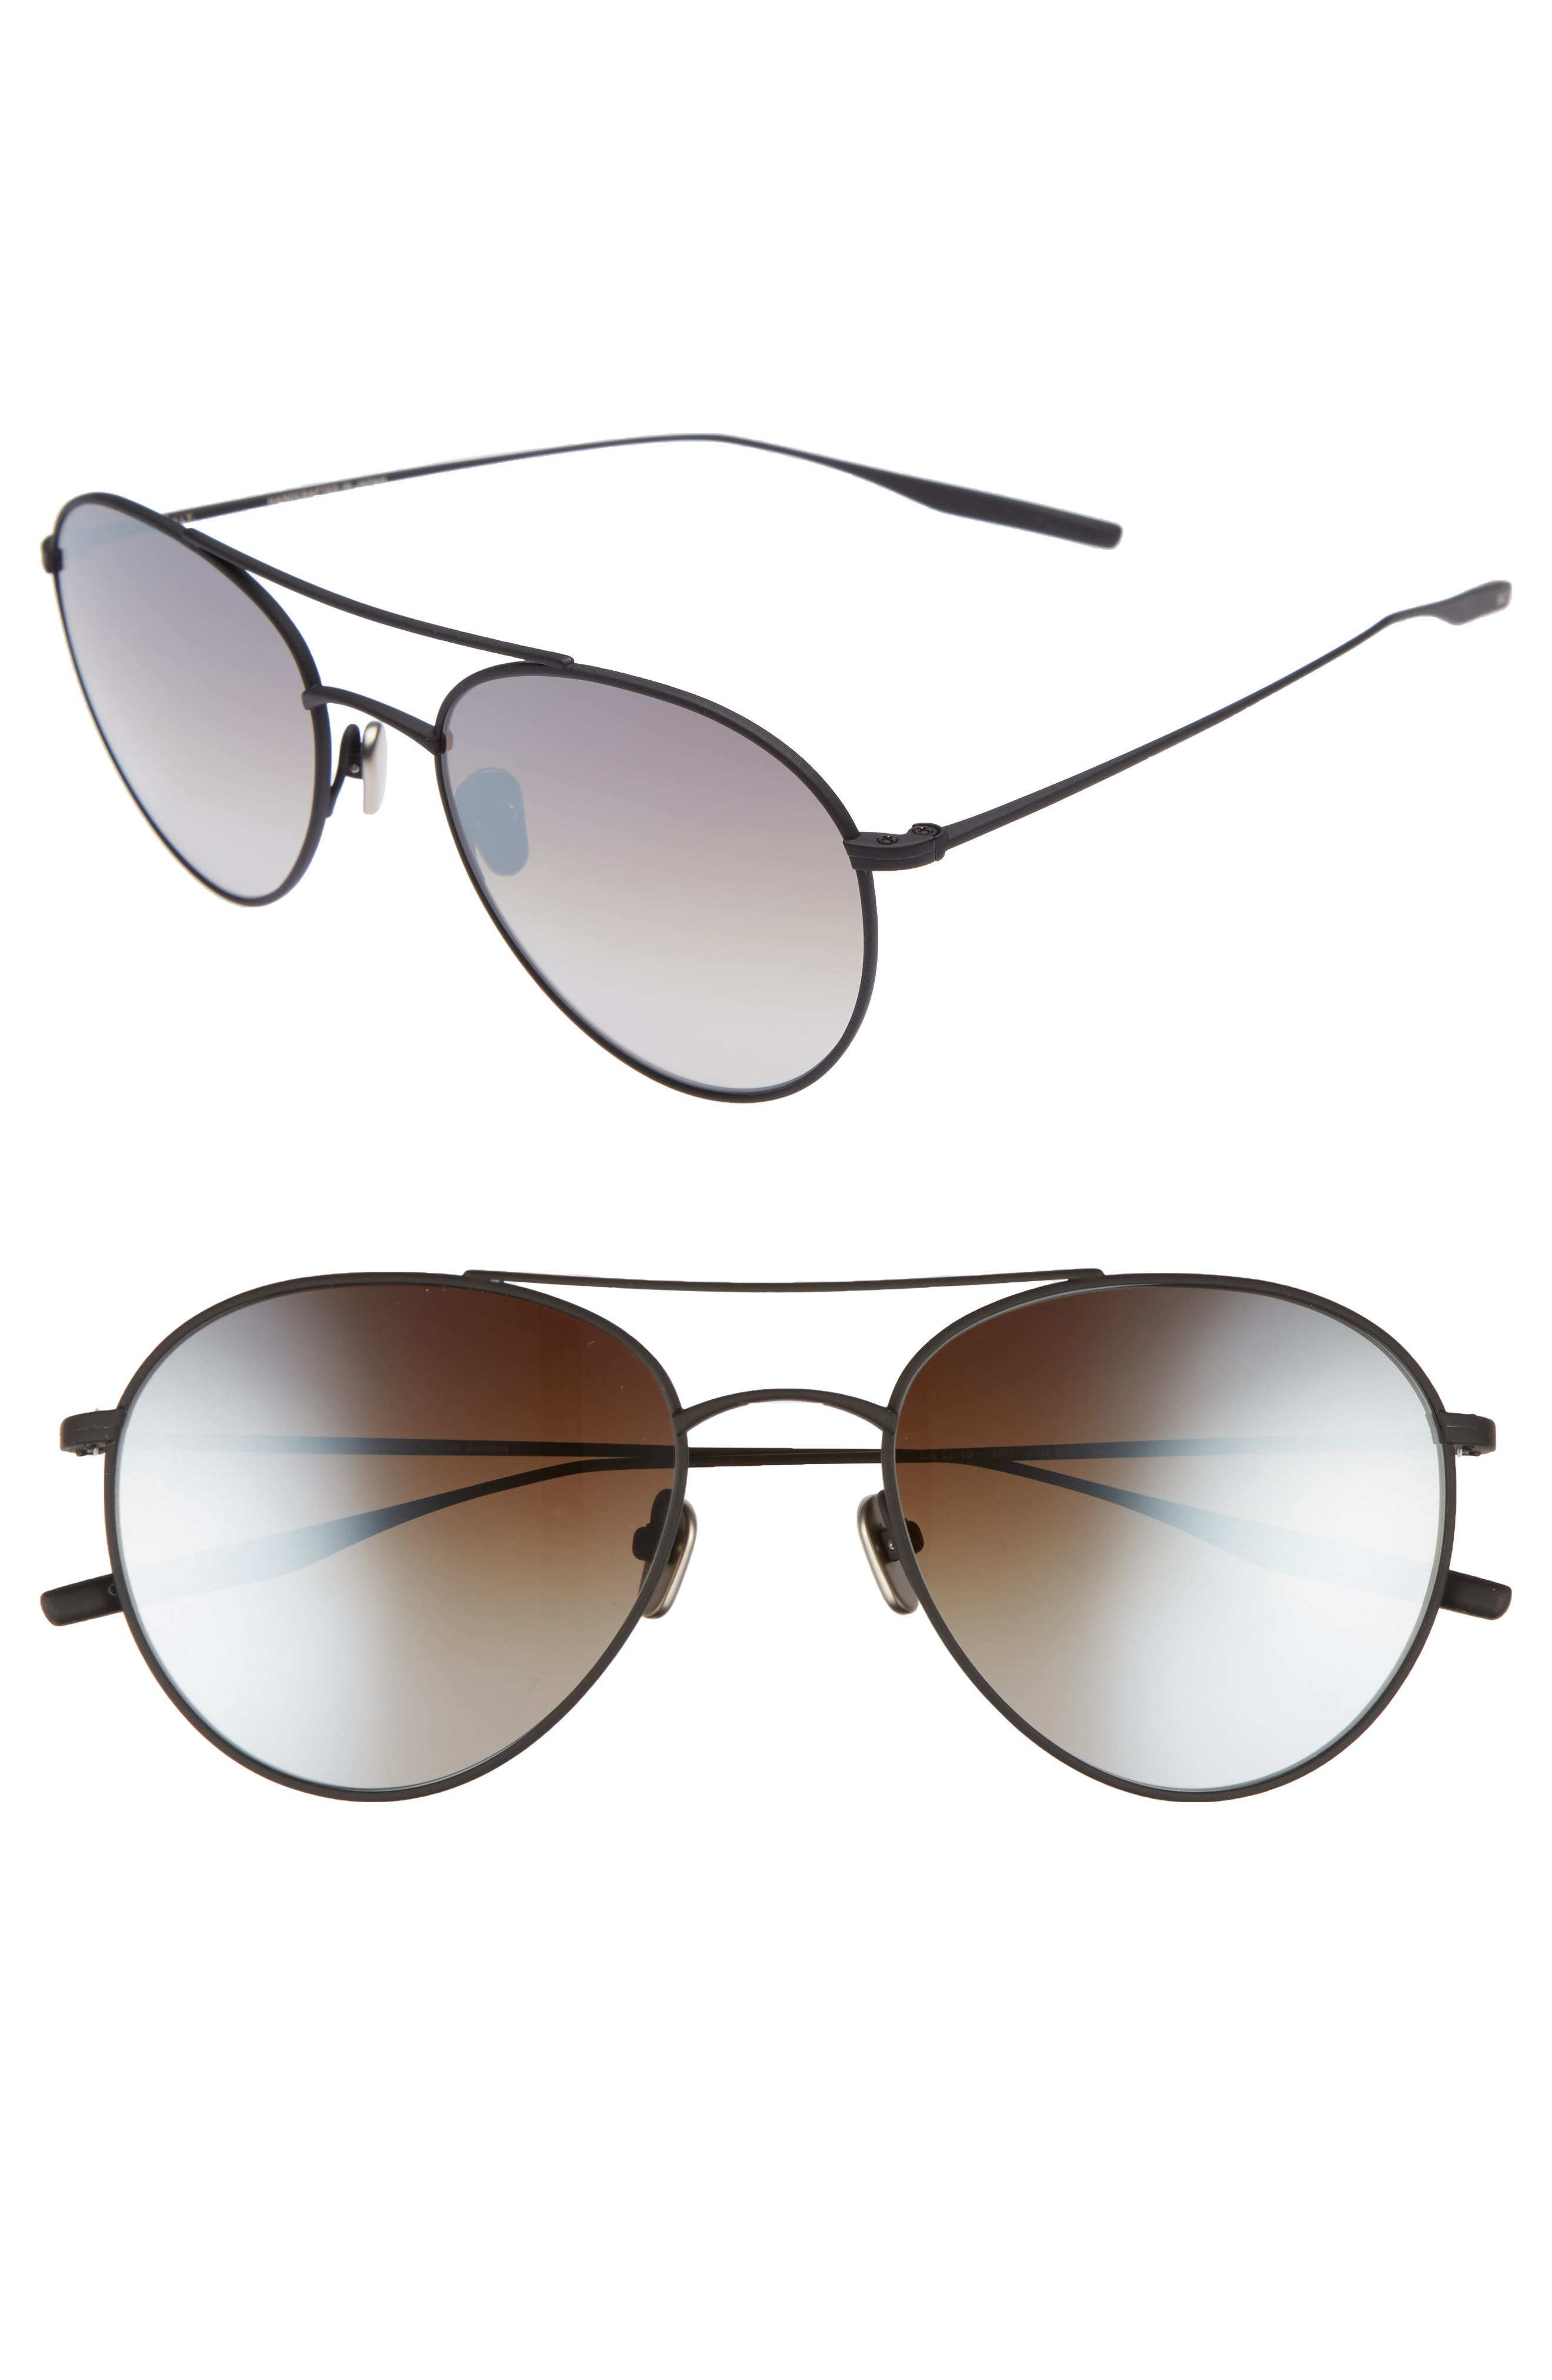 Fufkin 54mm Polarized Round Sunglasses,                         Main,                         color, Black Sand